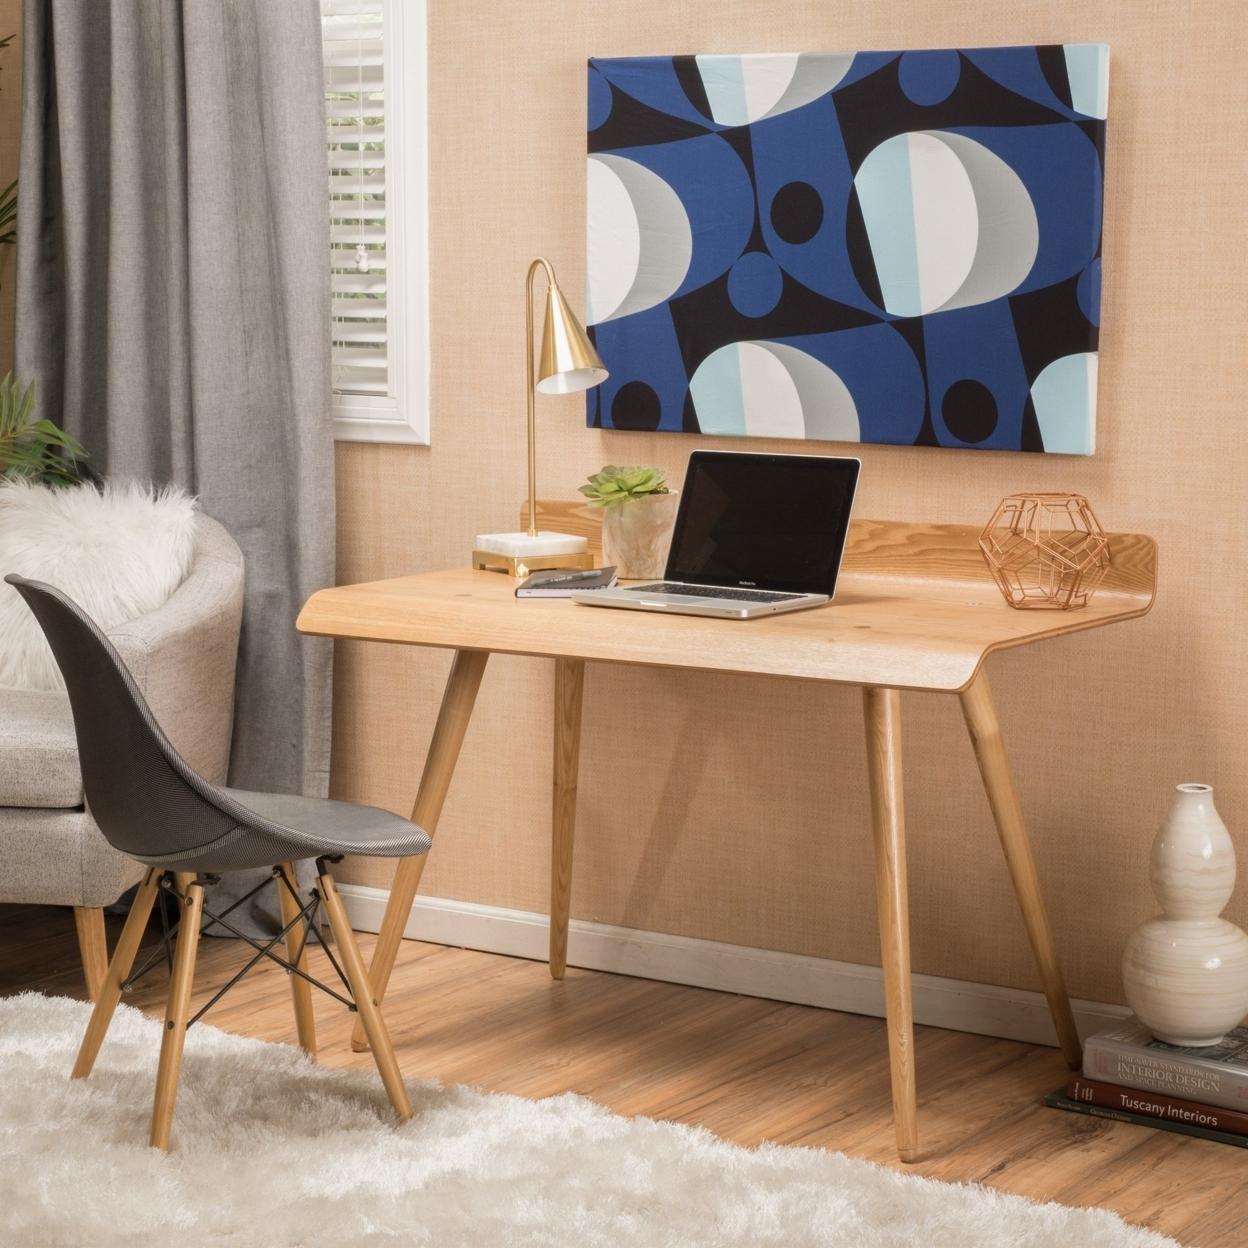 Turlra Contemporary Natural Tone Wood Computer Desk